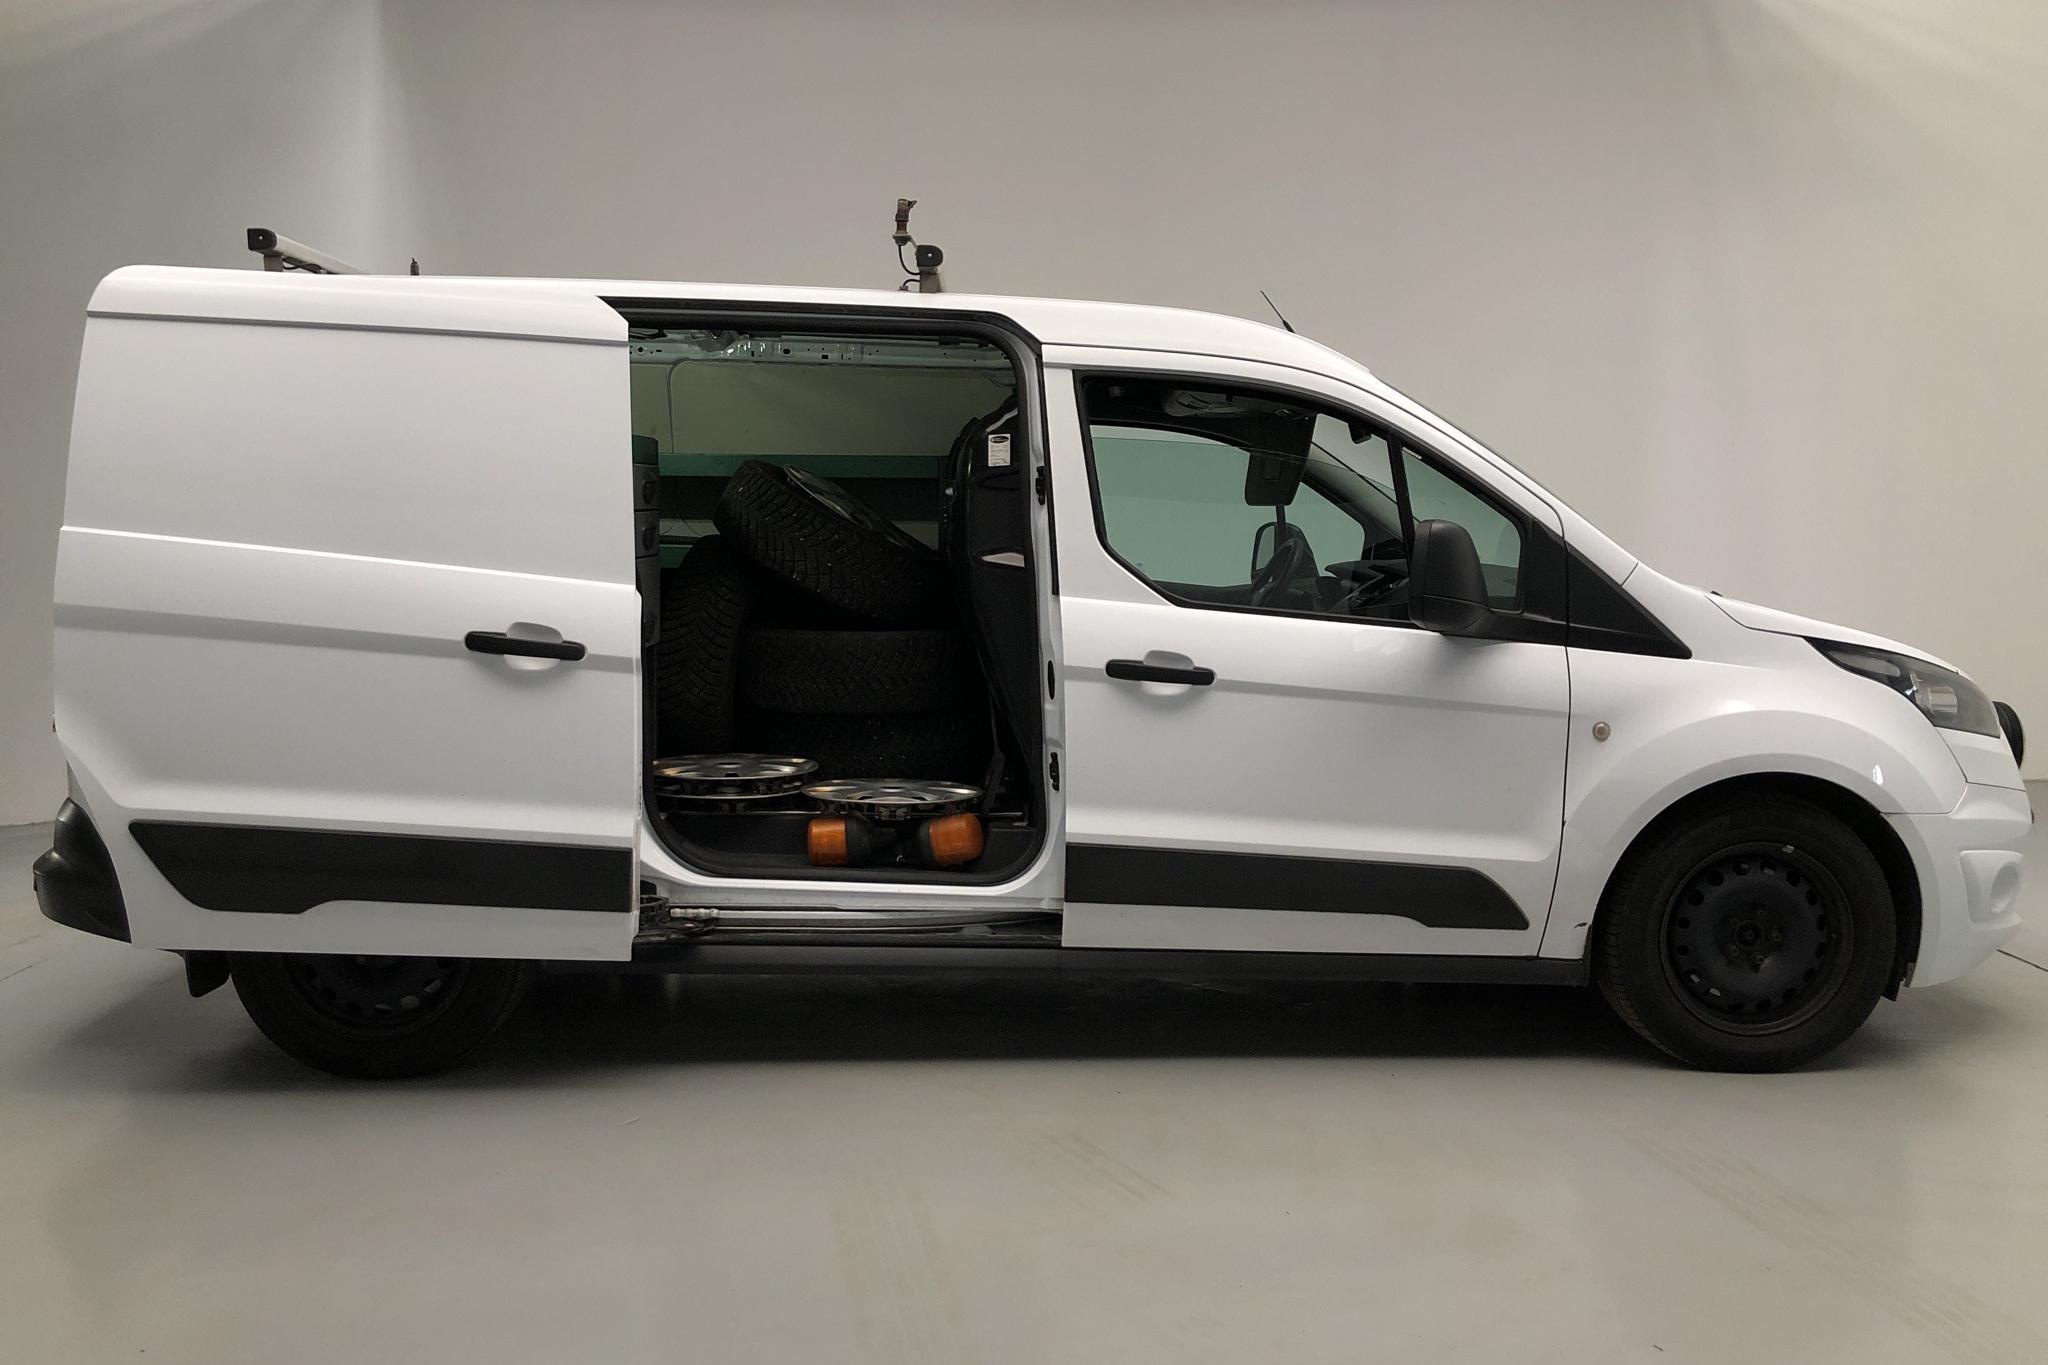 Ford Transit Connect 1.6 TDCi (95hk) - 29 678 mil - Manuell - vit - 2015